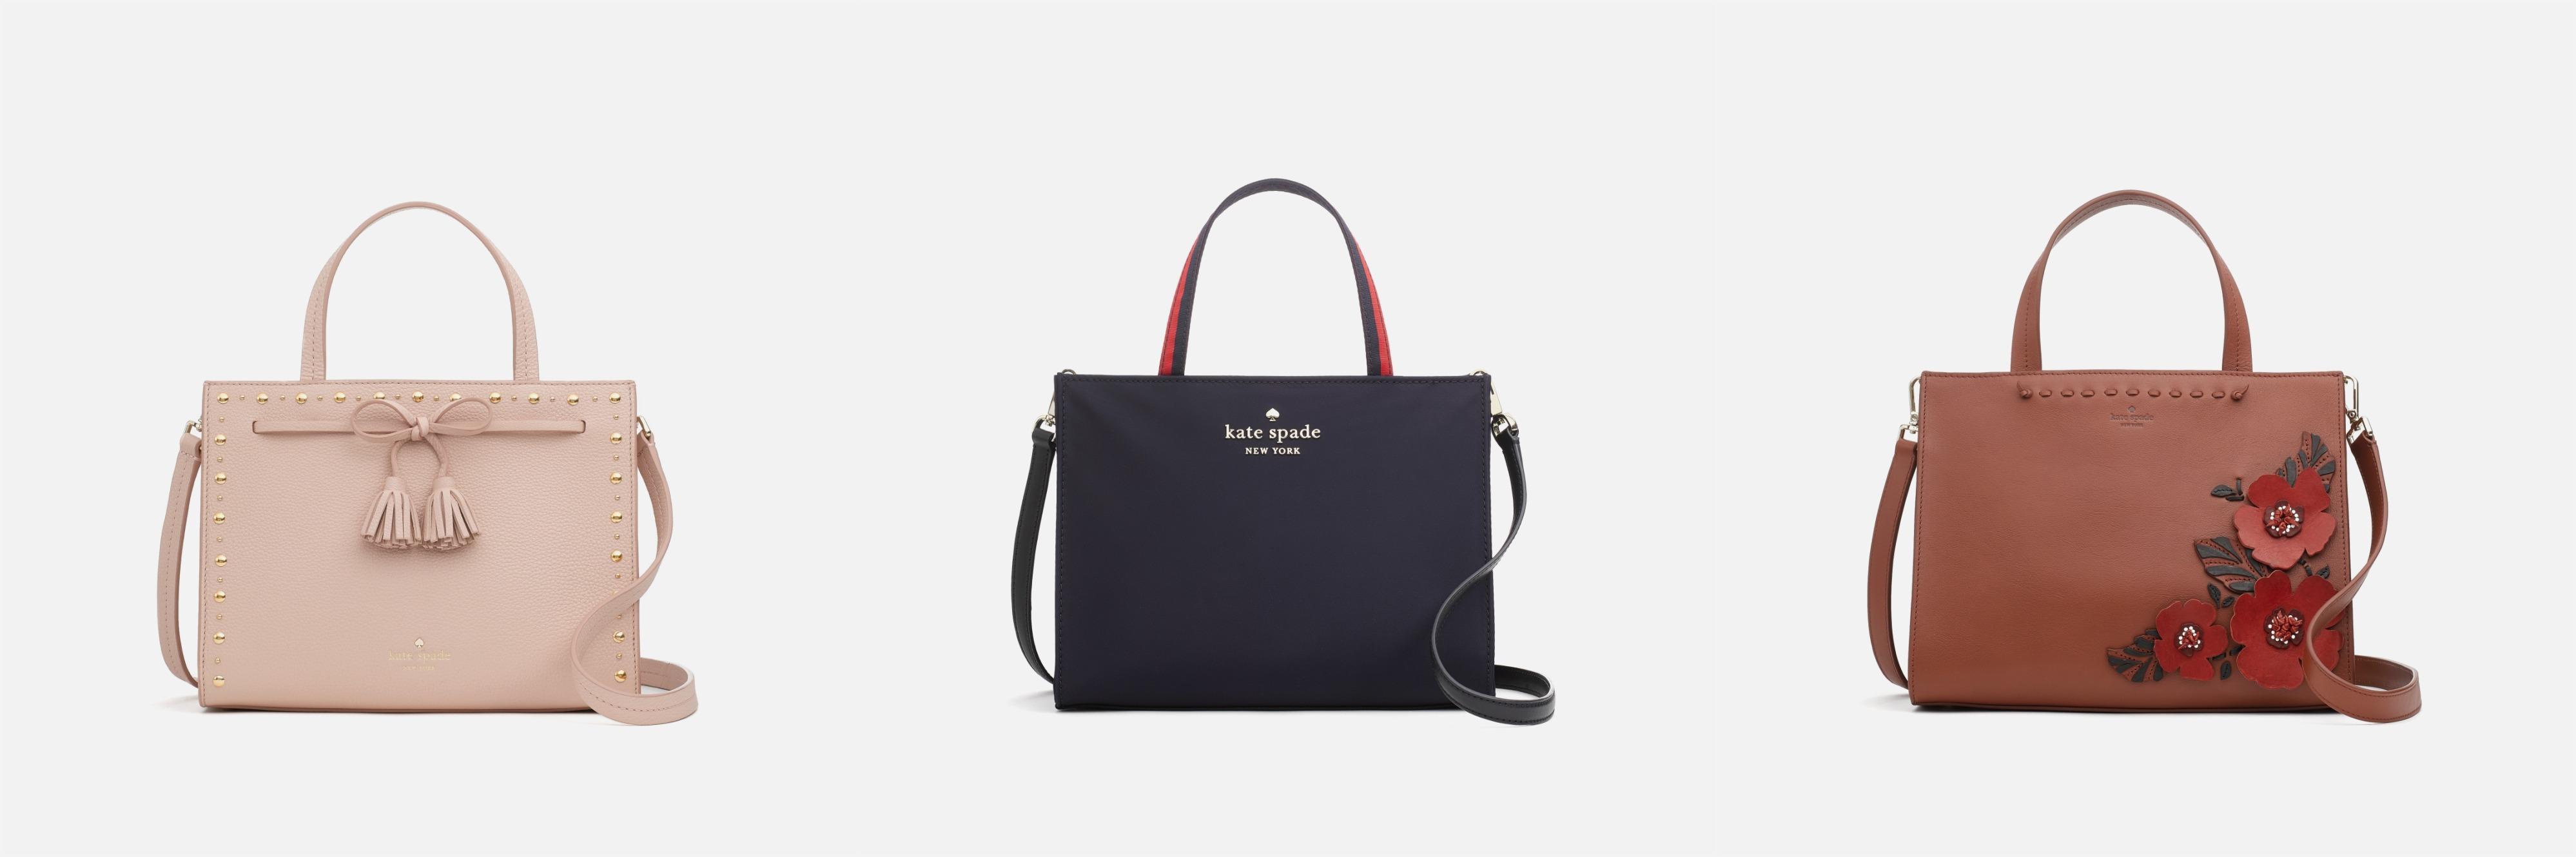 Kate Spade S Sam Bag The Designer S Legacy In One Iconic Bag Quartzy